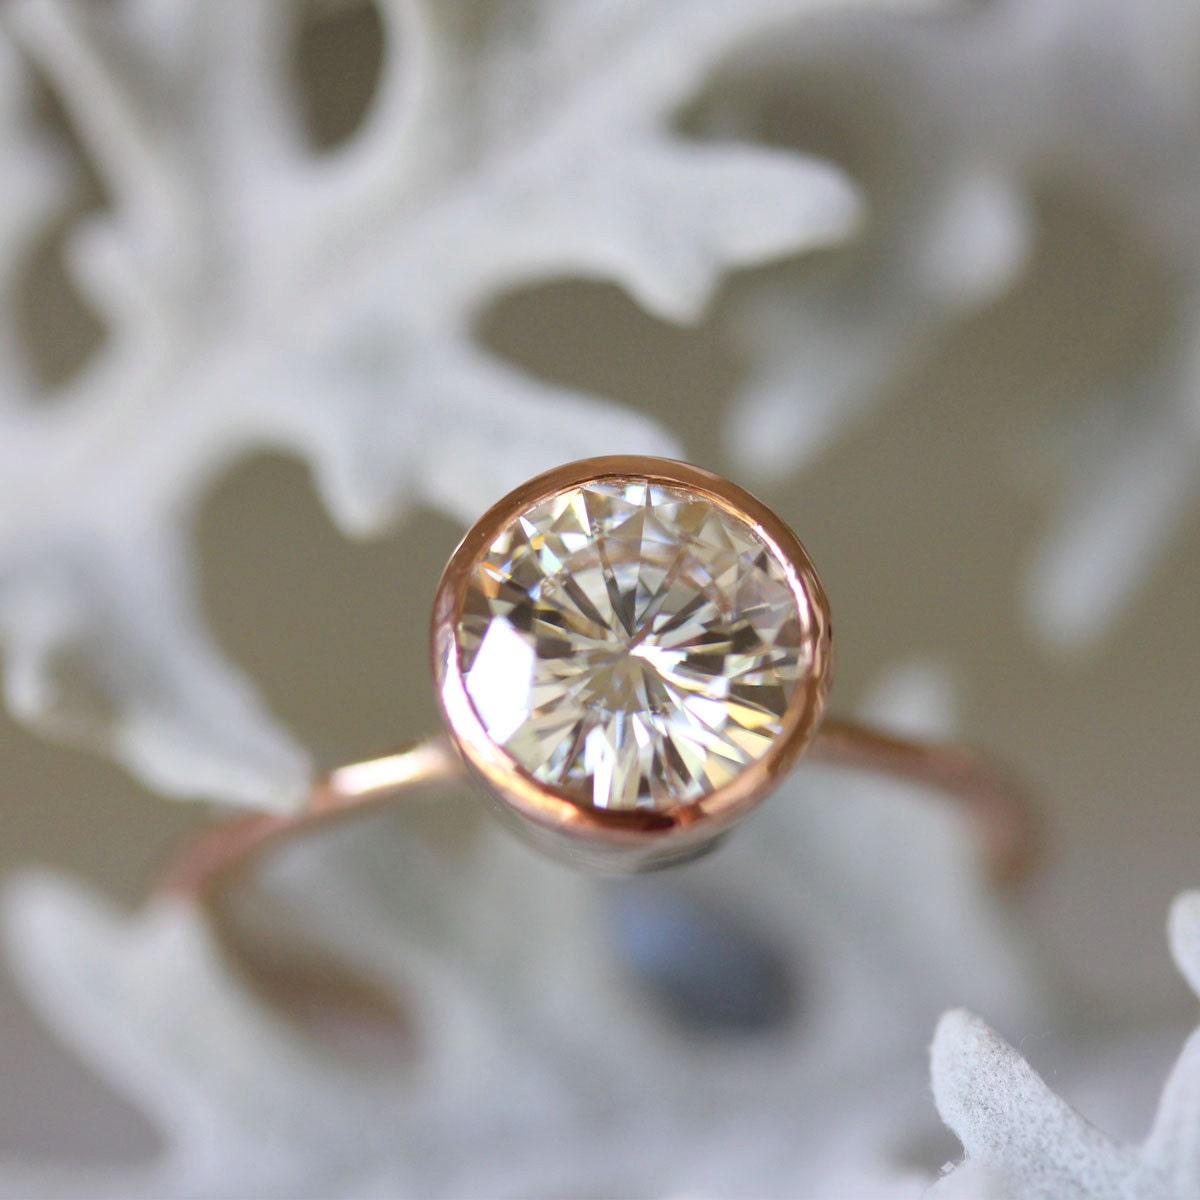 Engagement Rings With Moissanite: 7.5mm Moissanite 14K Rose Gold Engagement Ring Stacking Ring